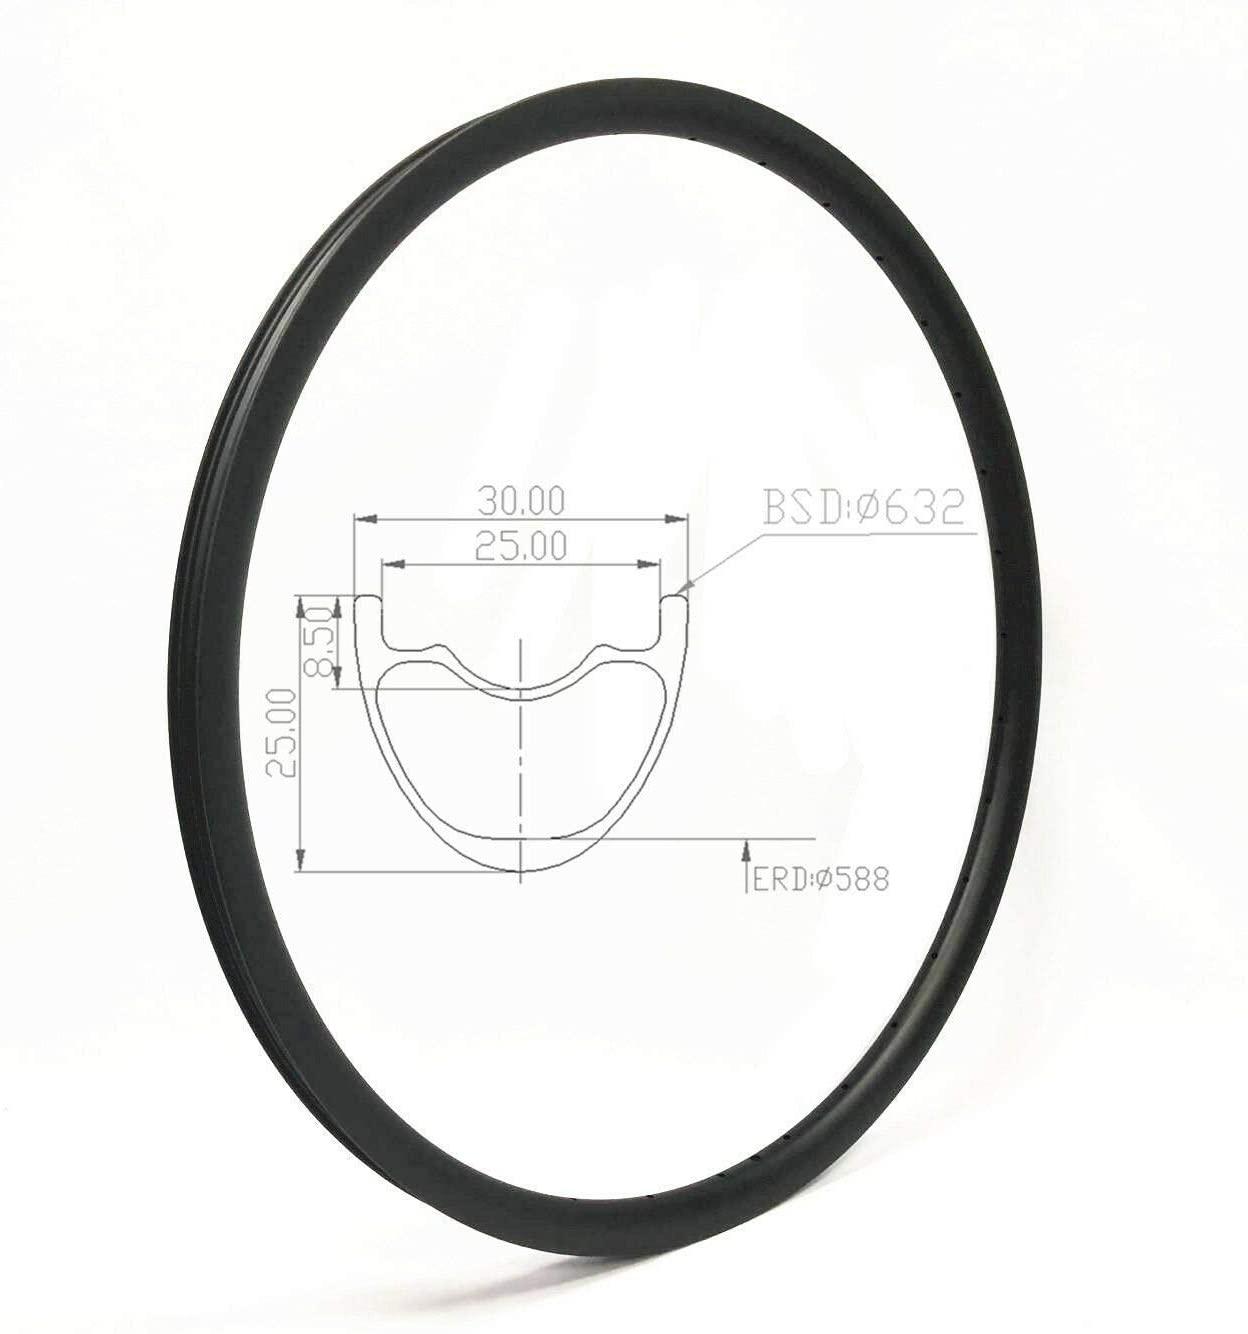 JIMAITEAM Carbon MTB Rims 29 inch 32Hole Carbon Mountain Bike Disc Brake Rim 30mm Width Tubeless XC Rim Carbon Bicycle Rim